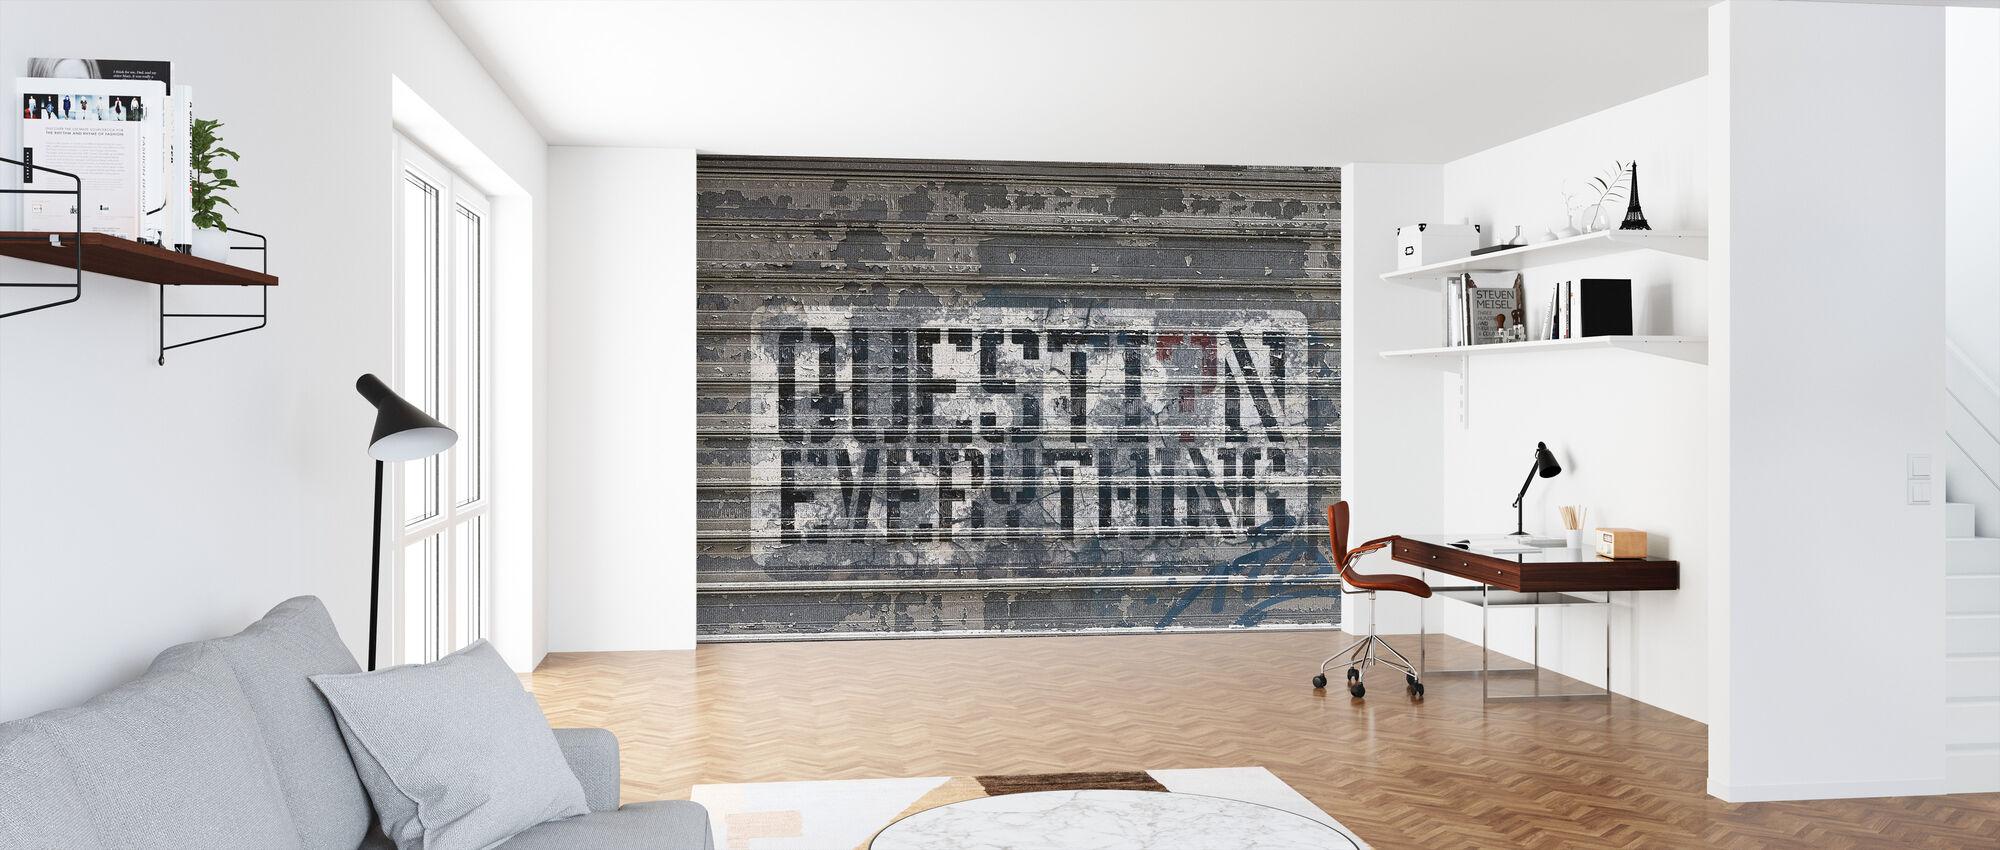 Graffiti Street Art - Papier peint - Bureau